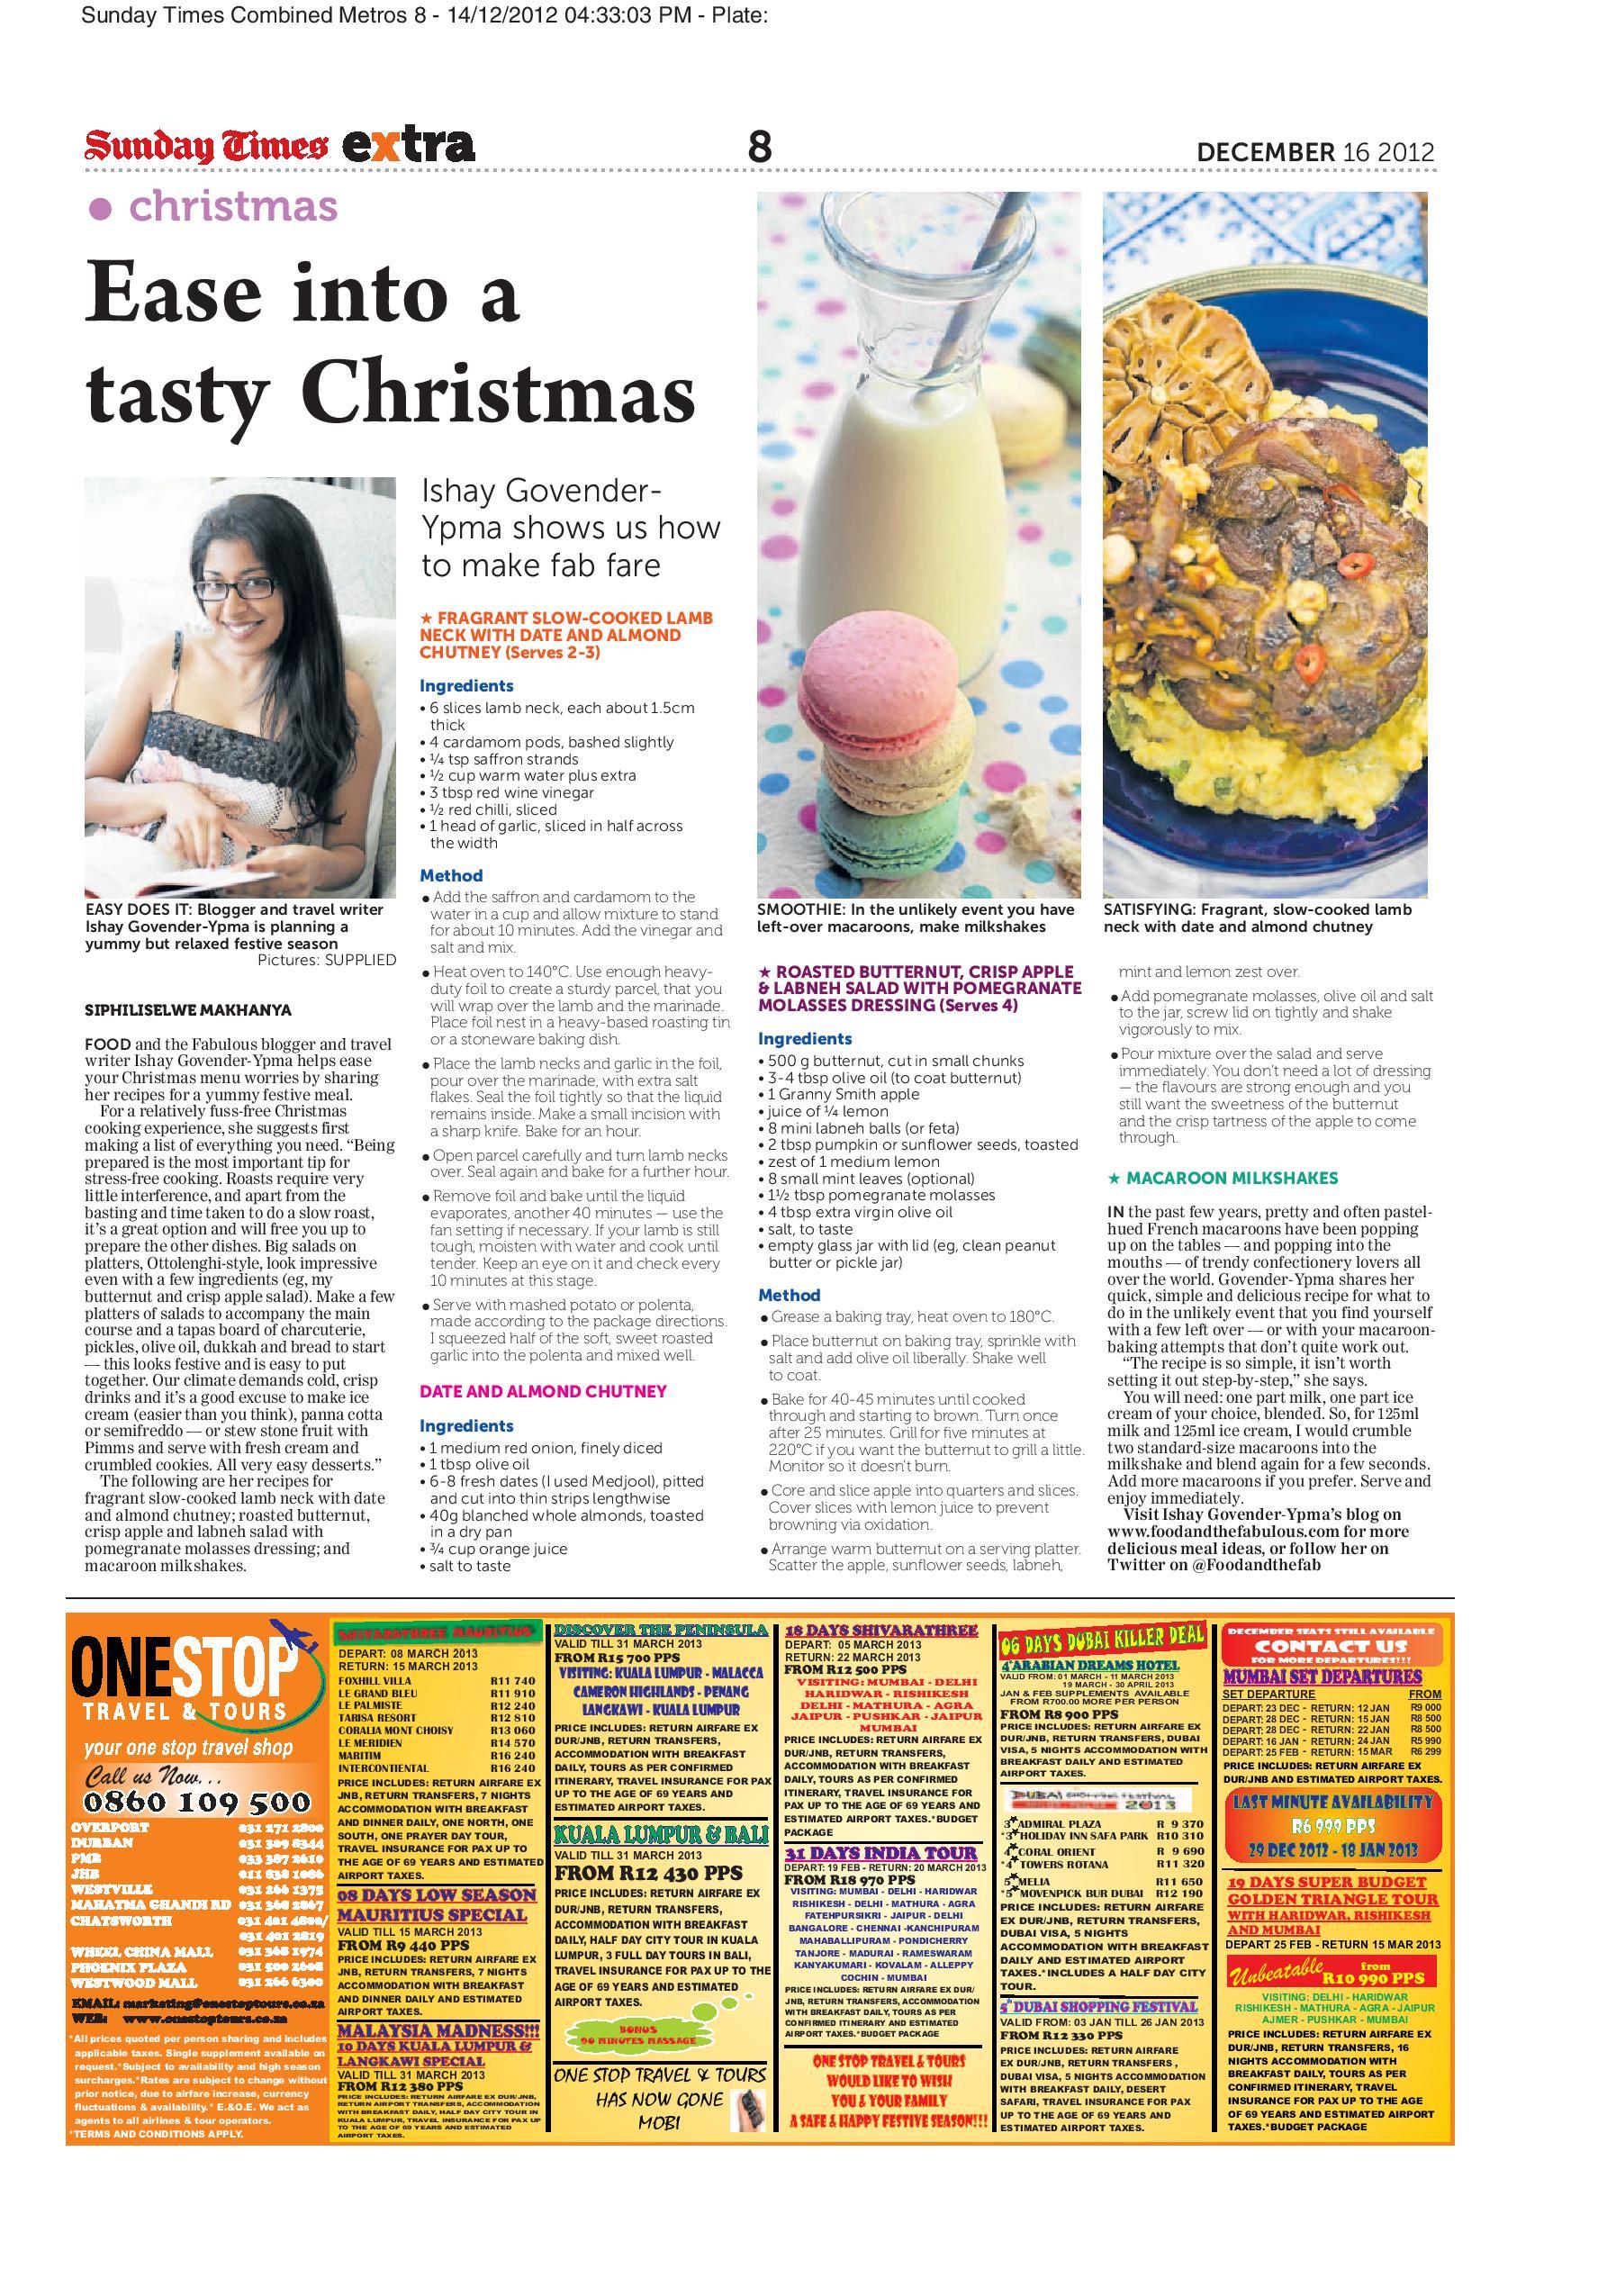 Sunday Times Extra